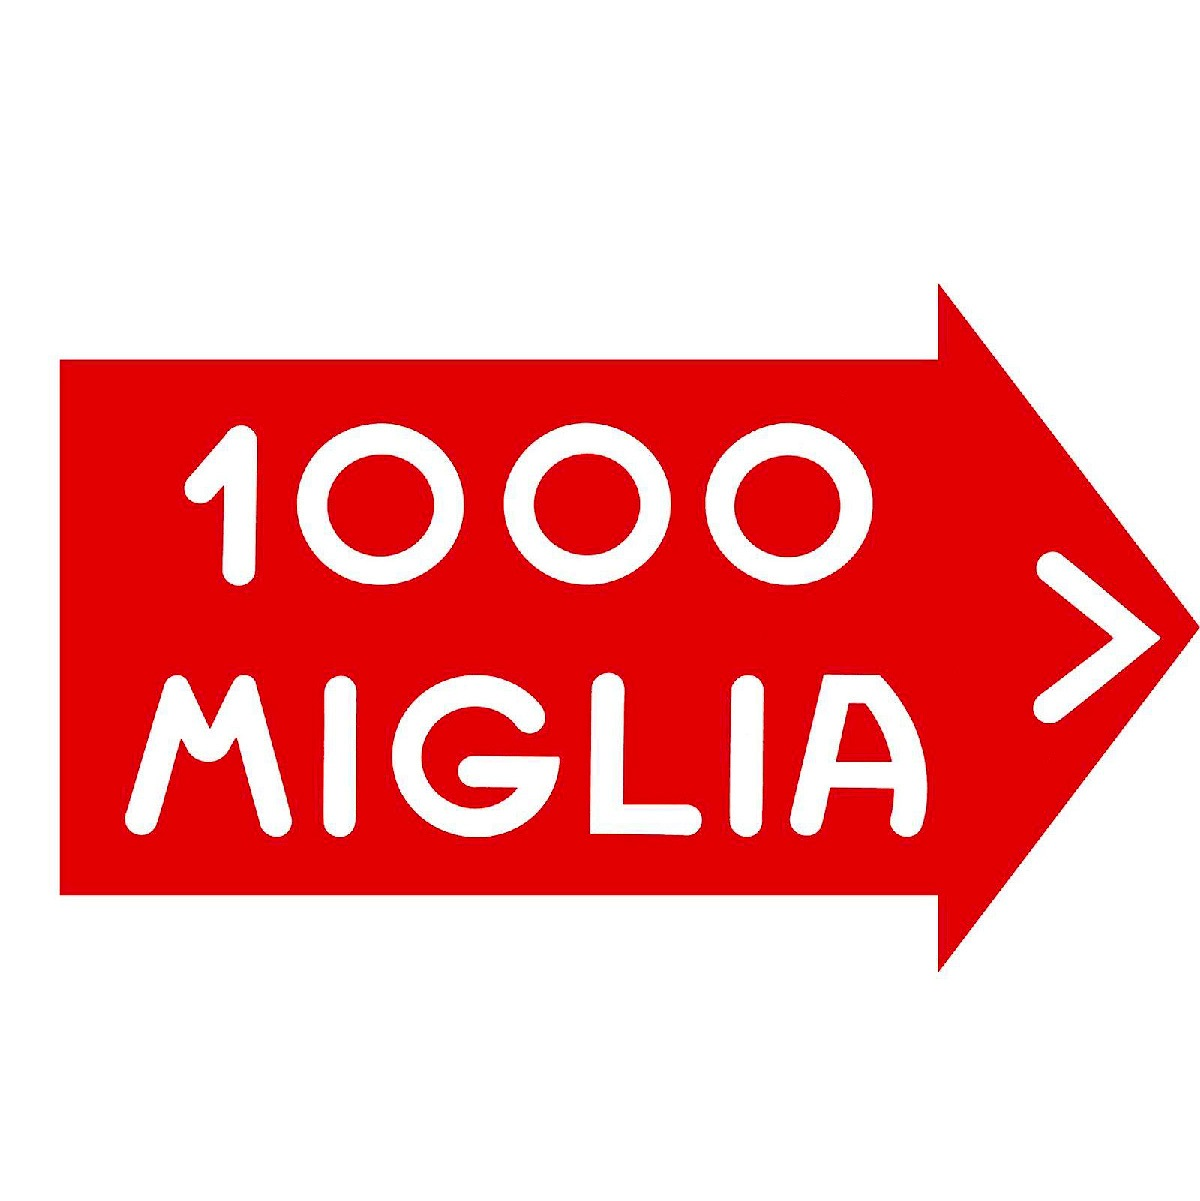 mille miglia sign